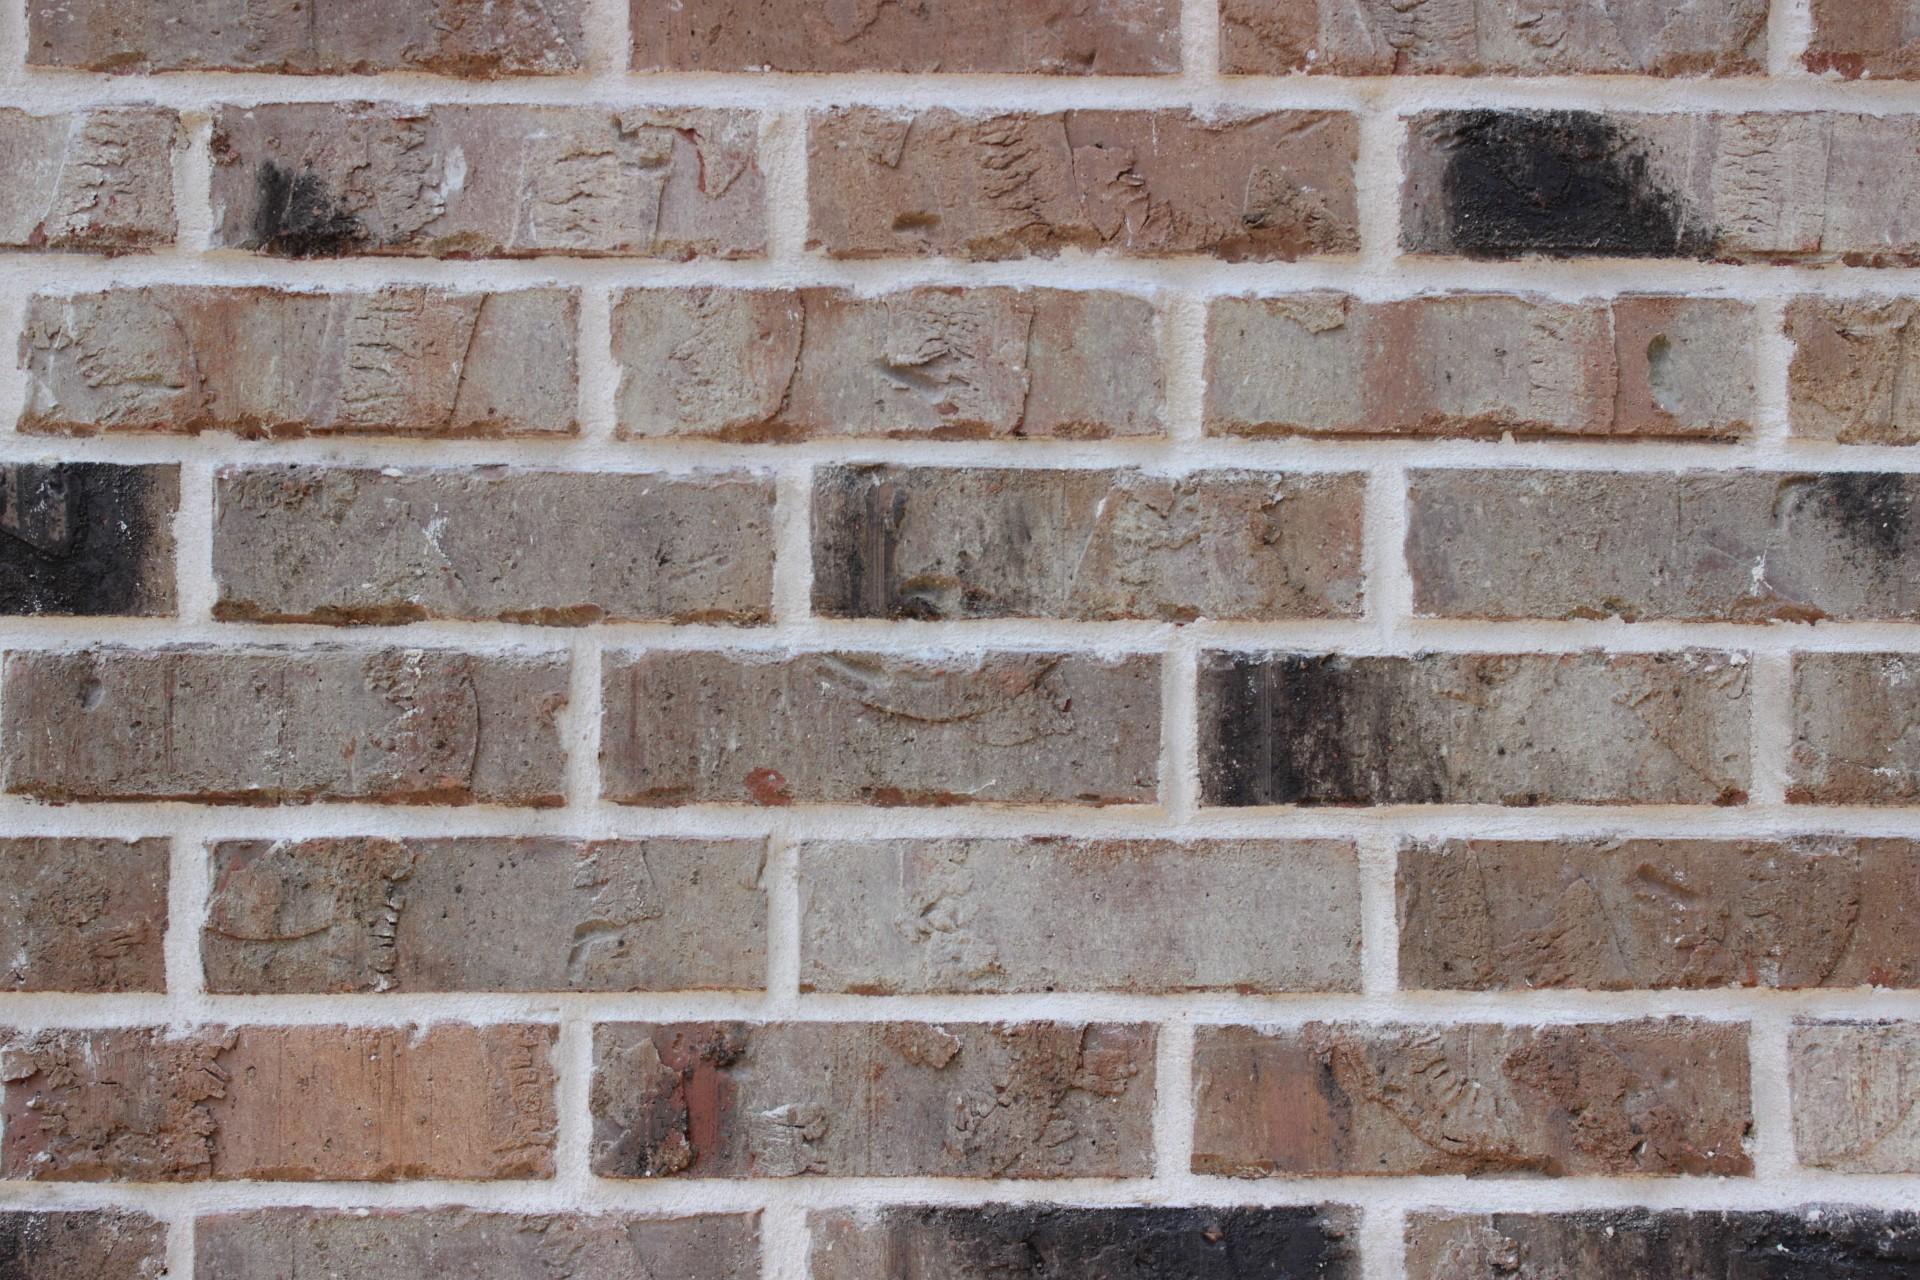 Seeley Town Brick